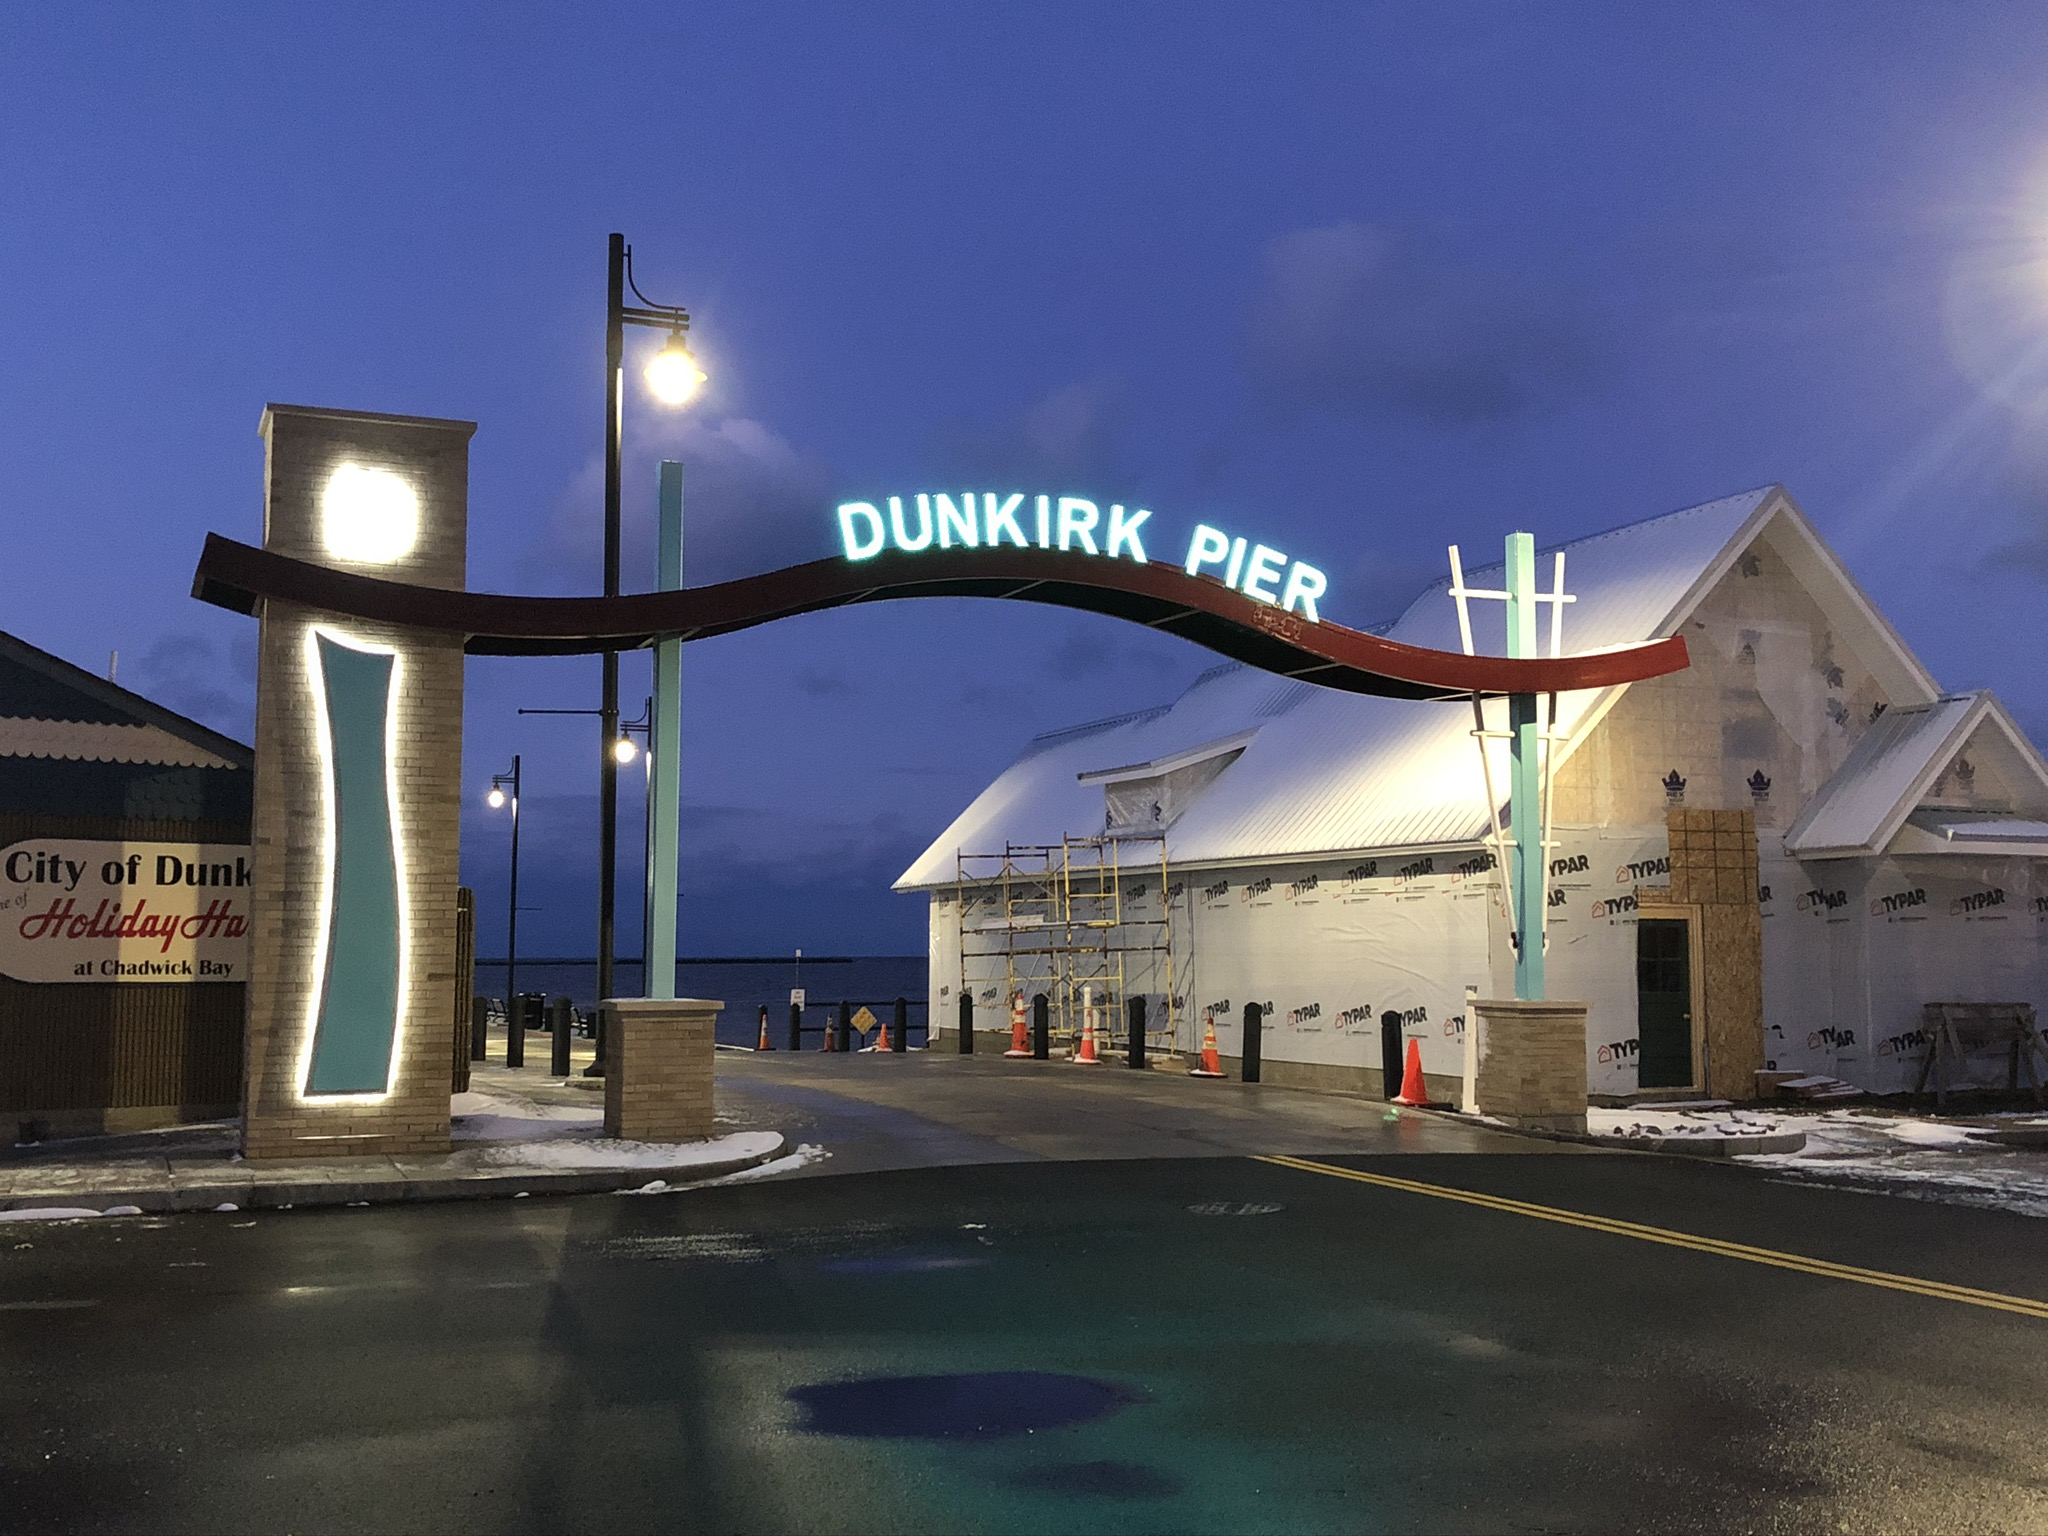 Dunkirk Pier